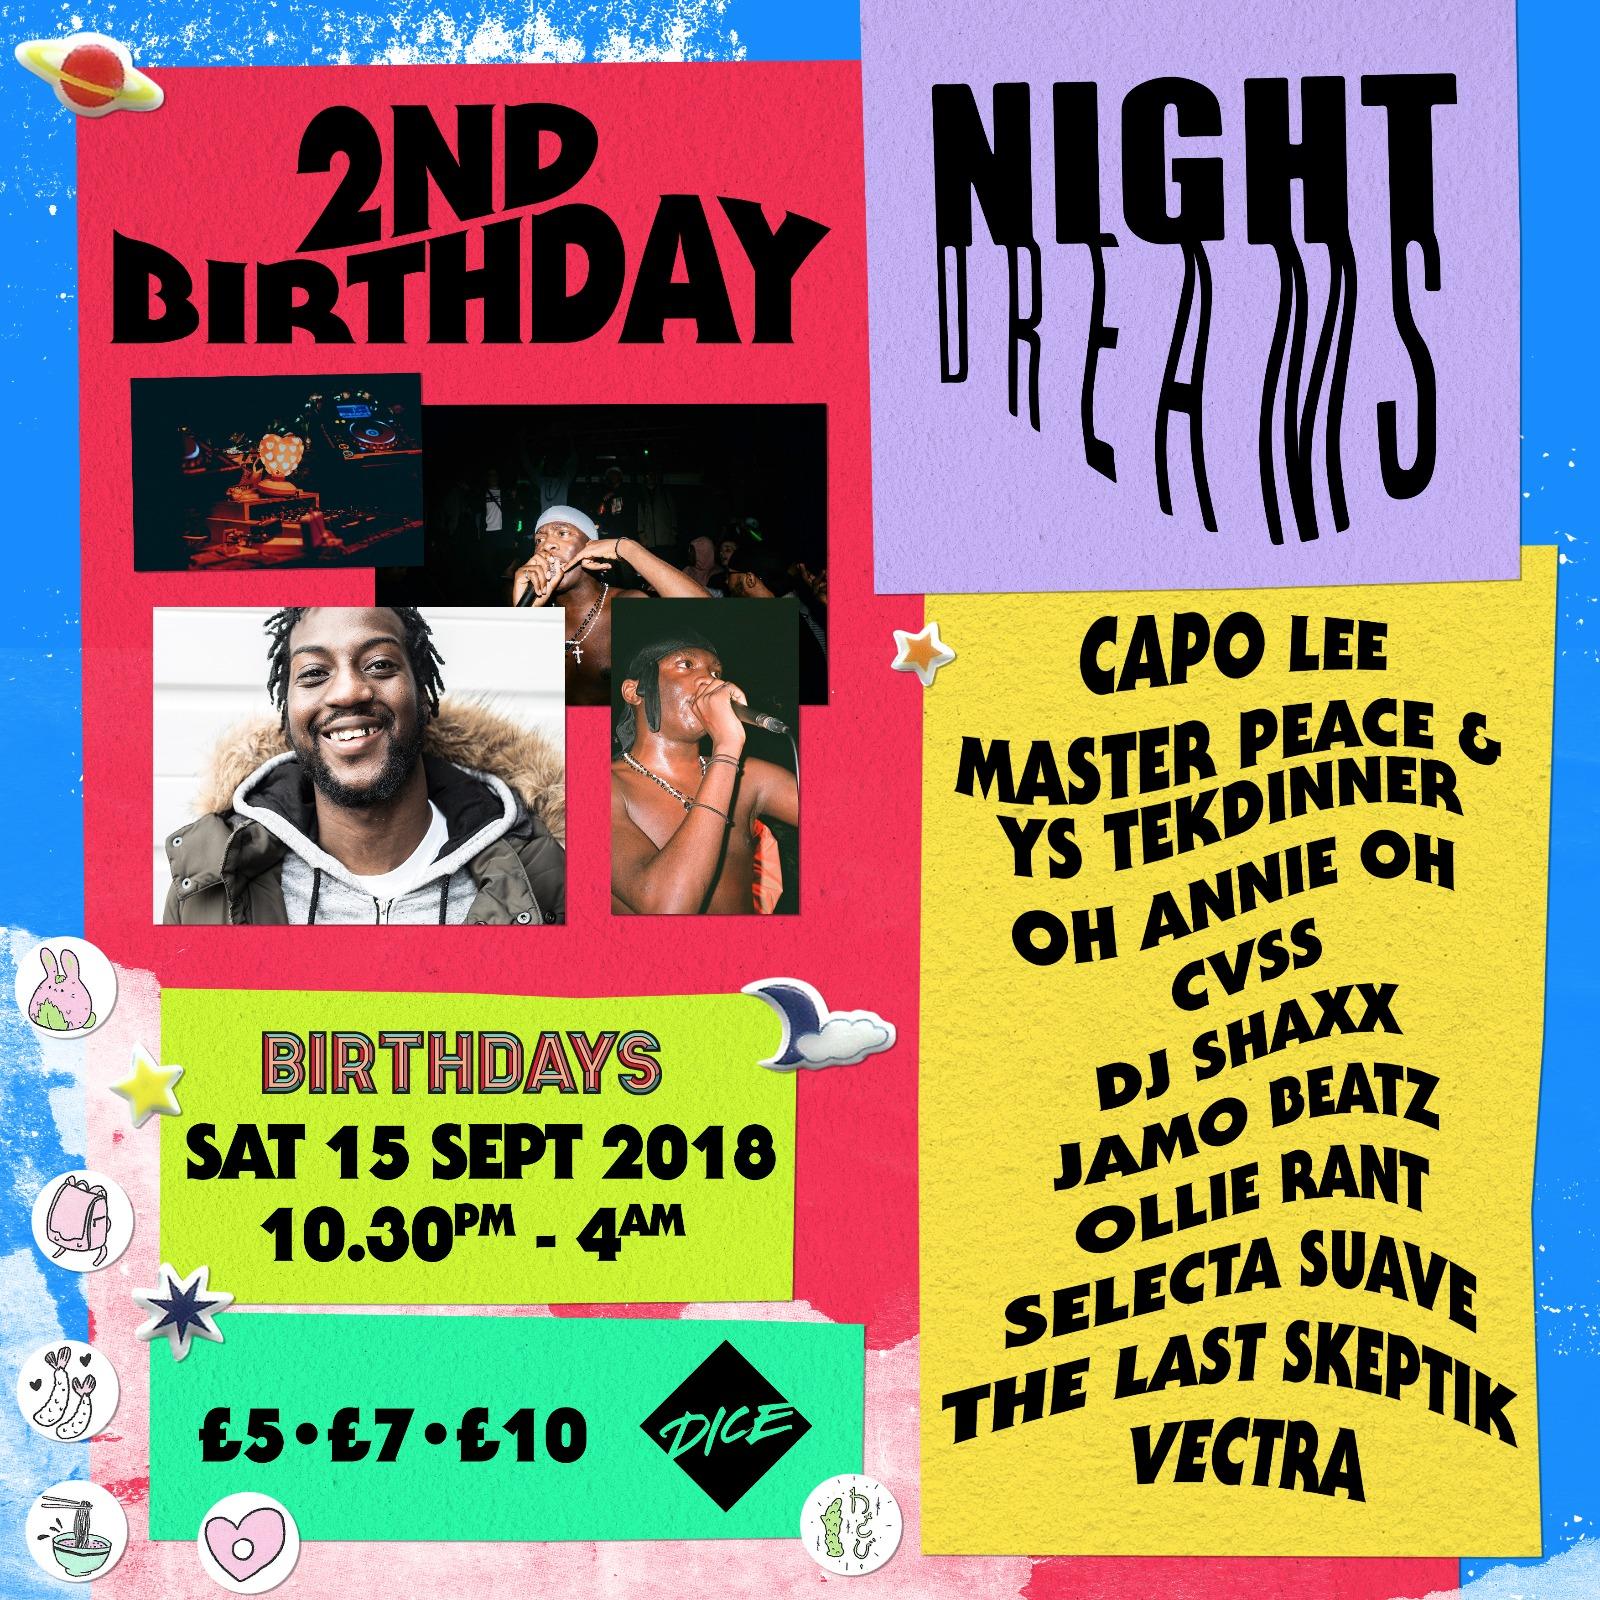 Night Dreams SQUARE - 2nd Birthday - Sat 15 Sept 2018.jpeg